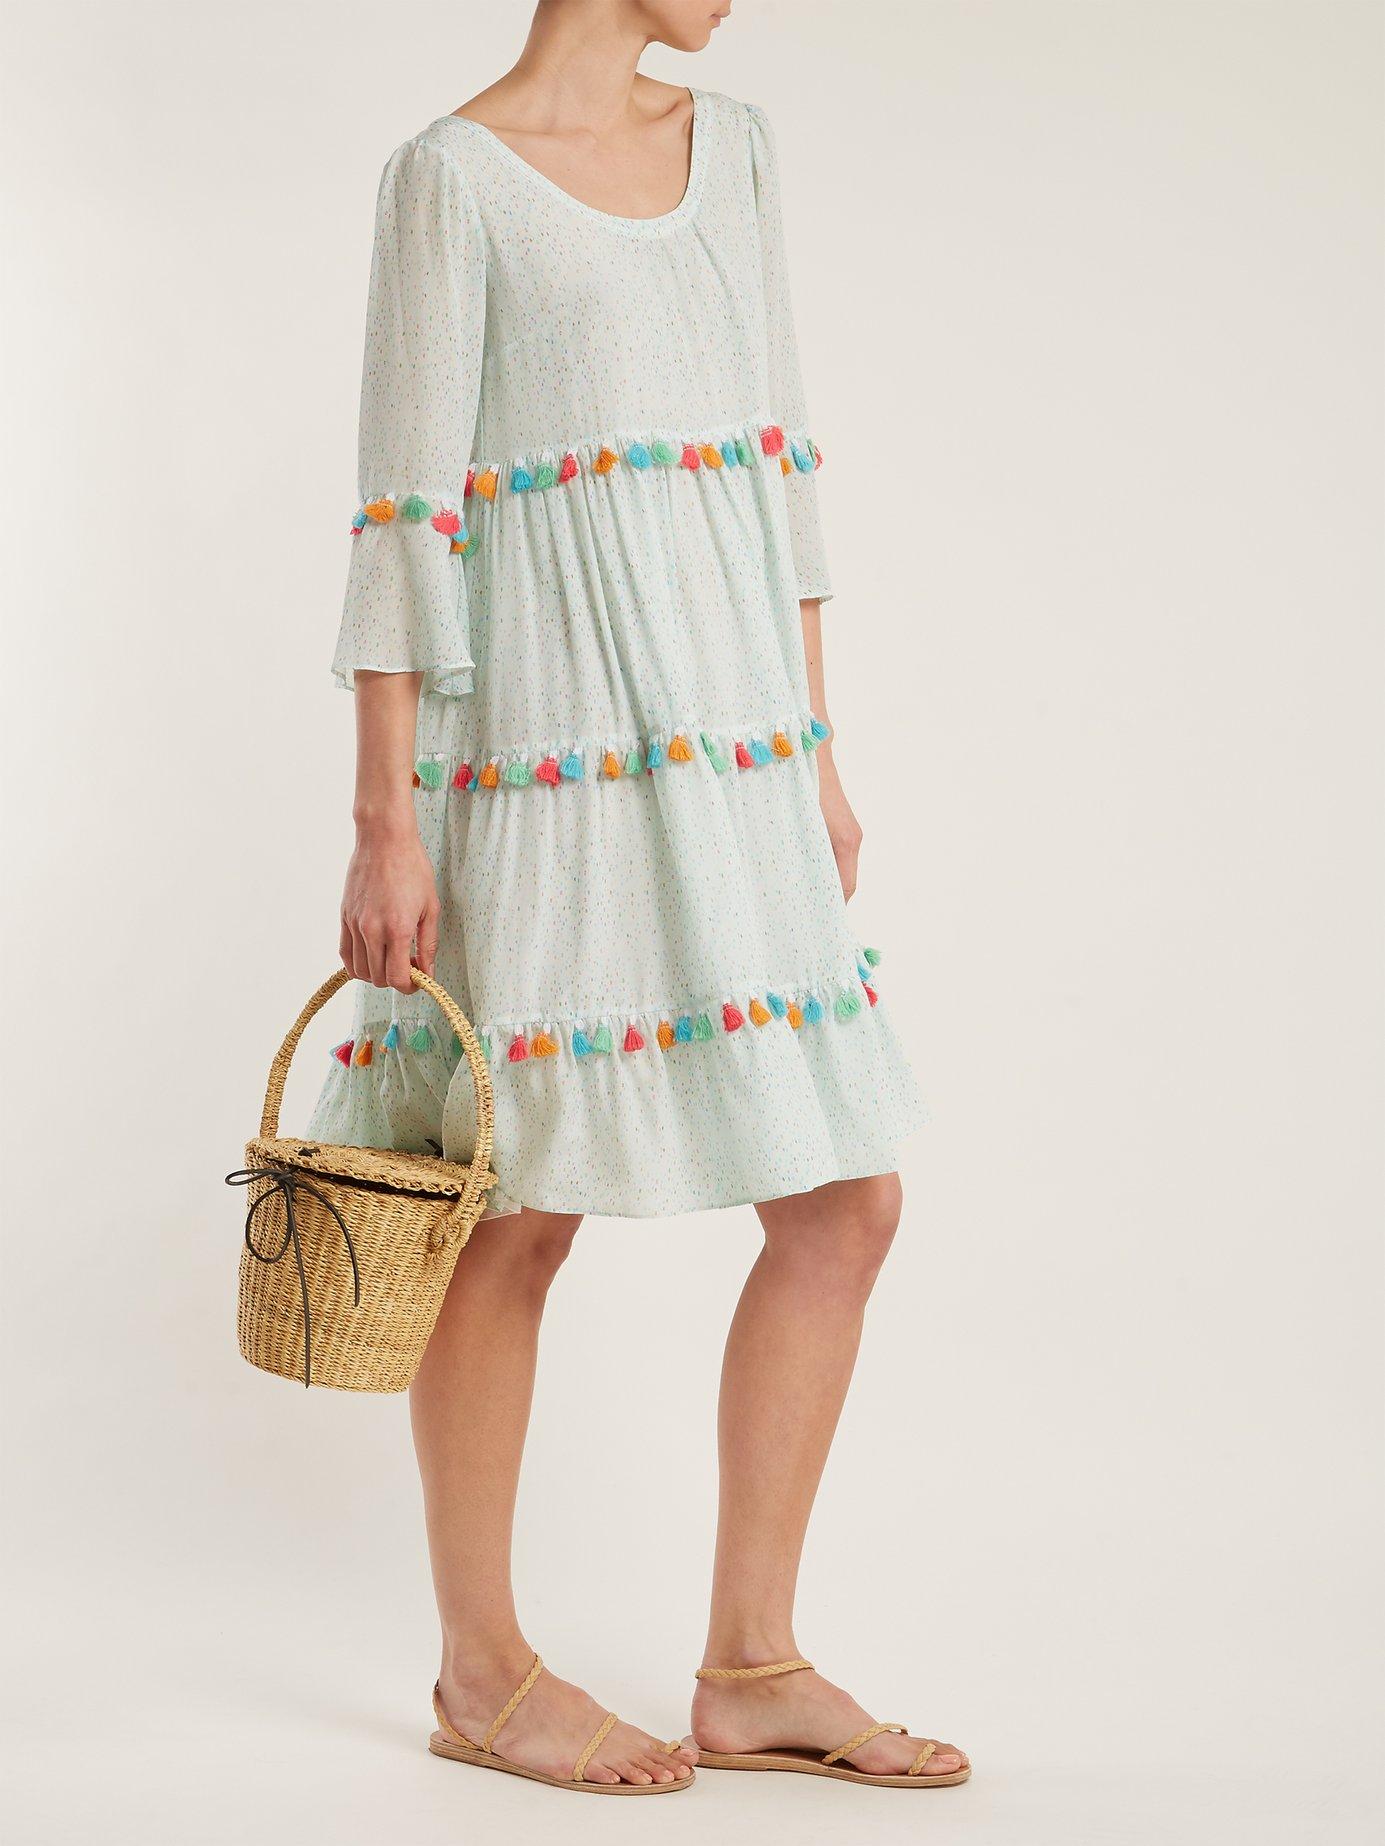 Spring Rainbow tassel-trimmed tiered silk dress by Athena Procopiou